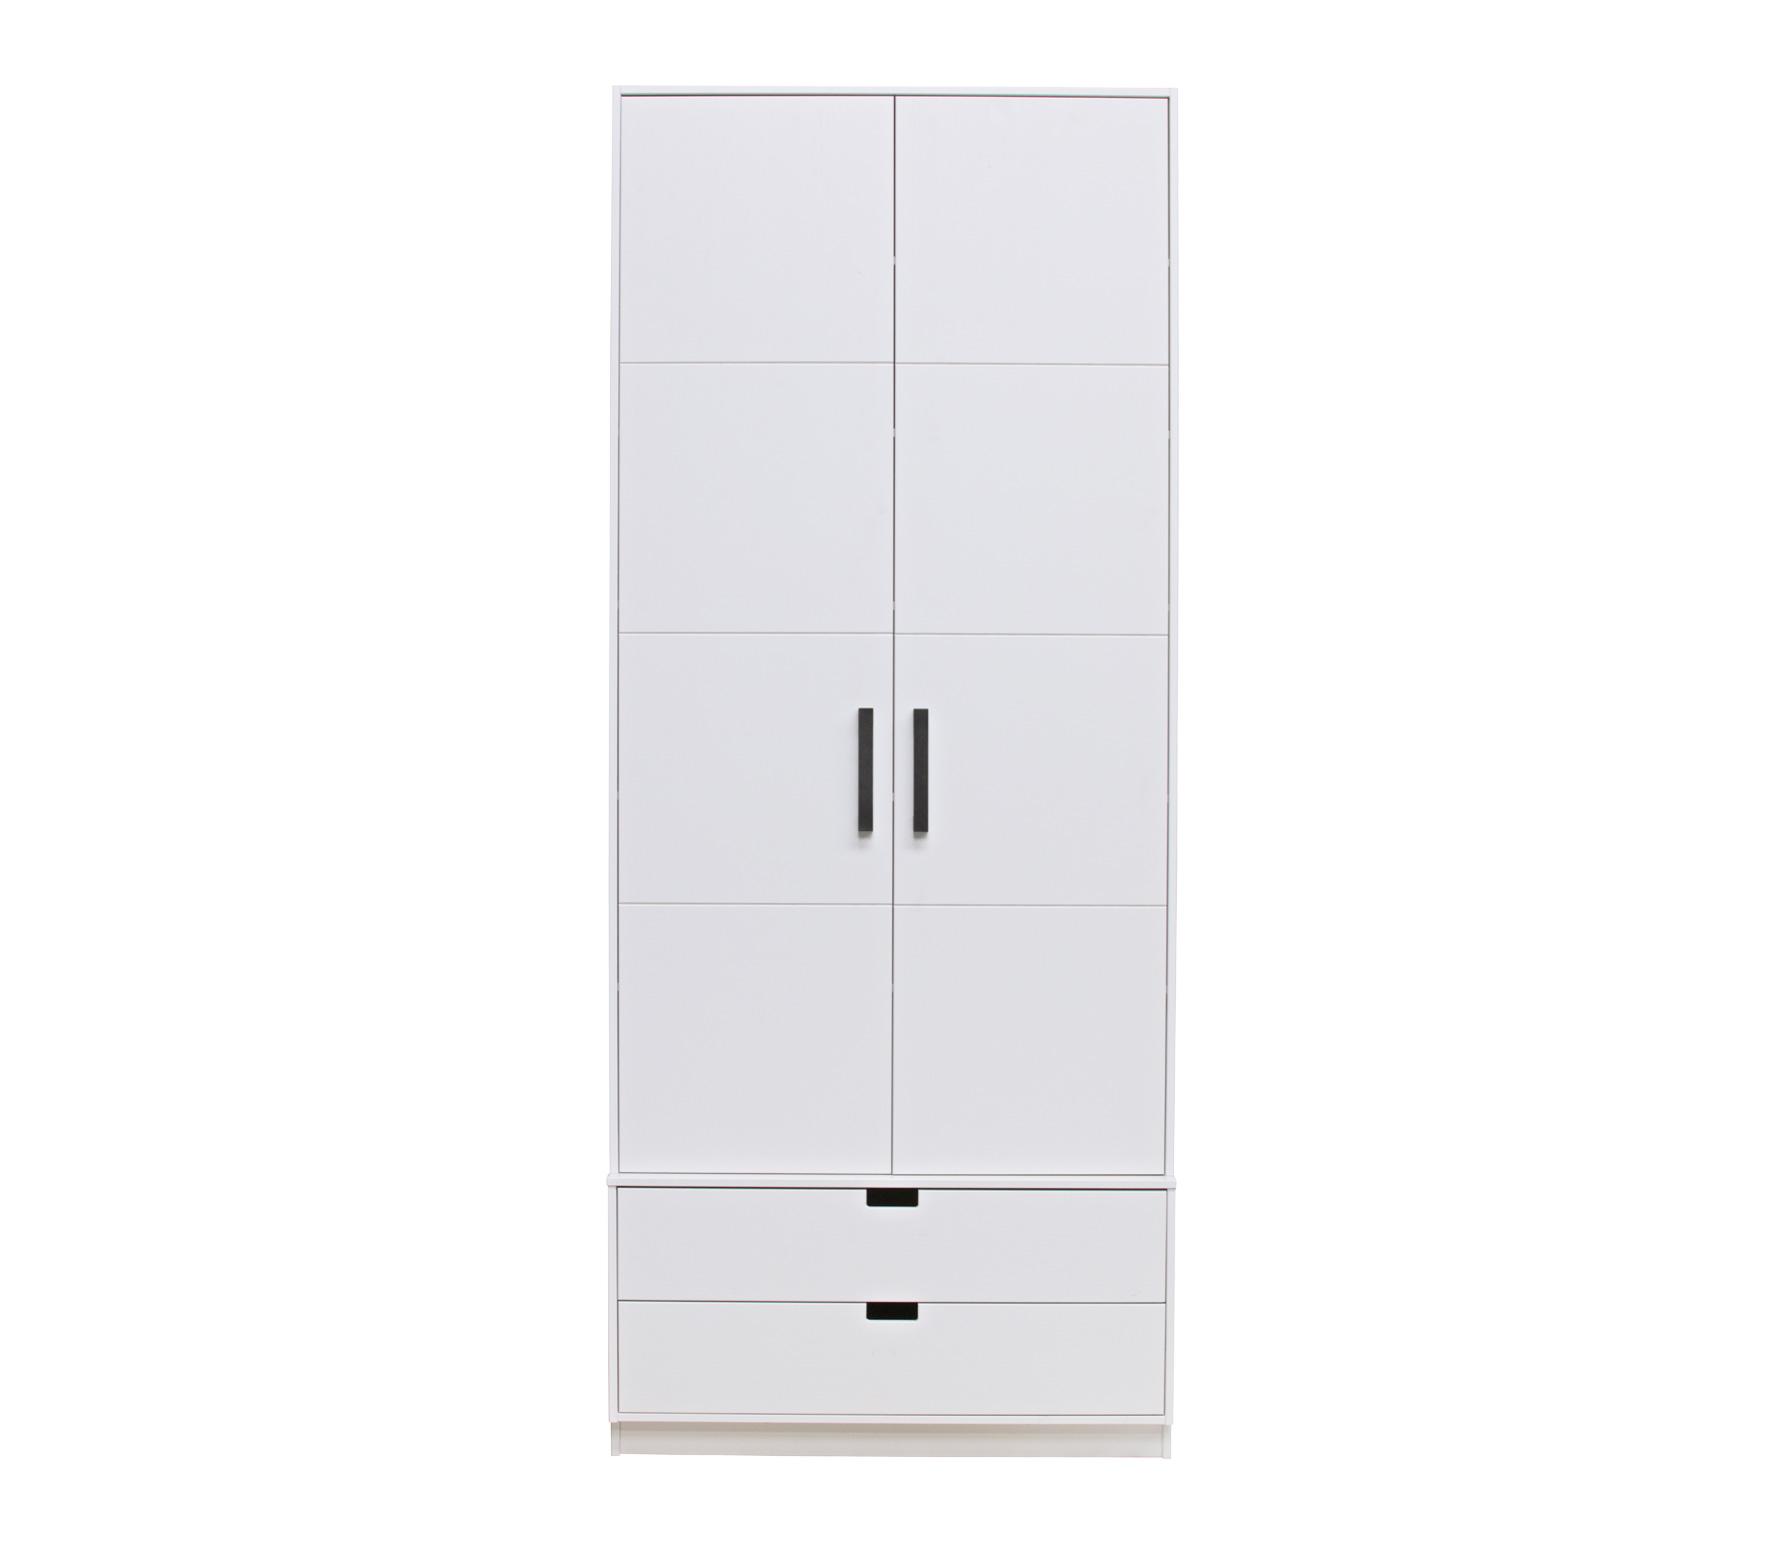 Basiclabel SKIK kast variant 1 wit 231x95x62 cm massief grenen